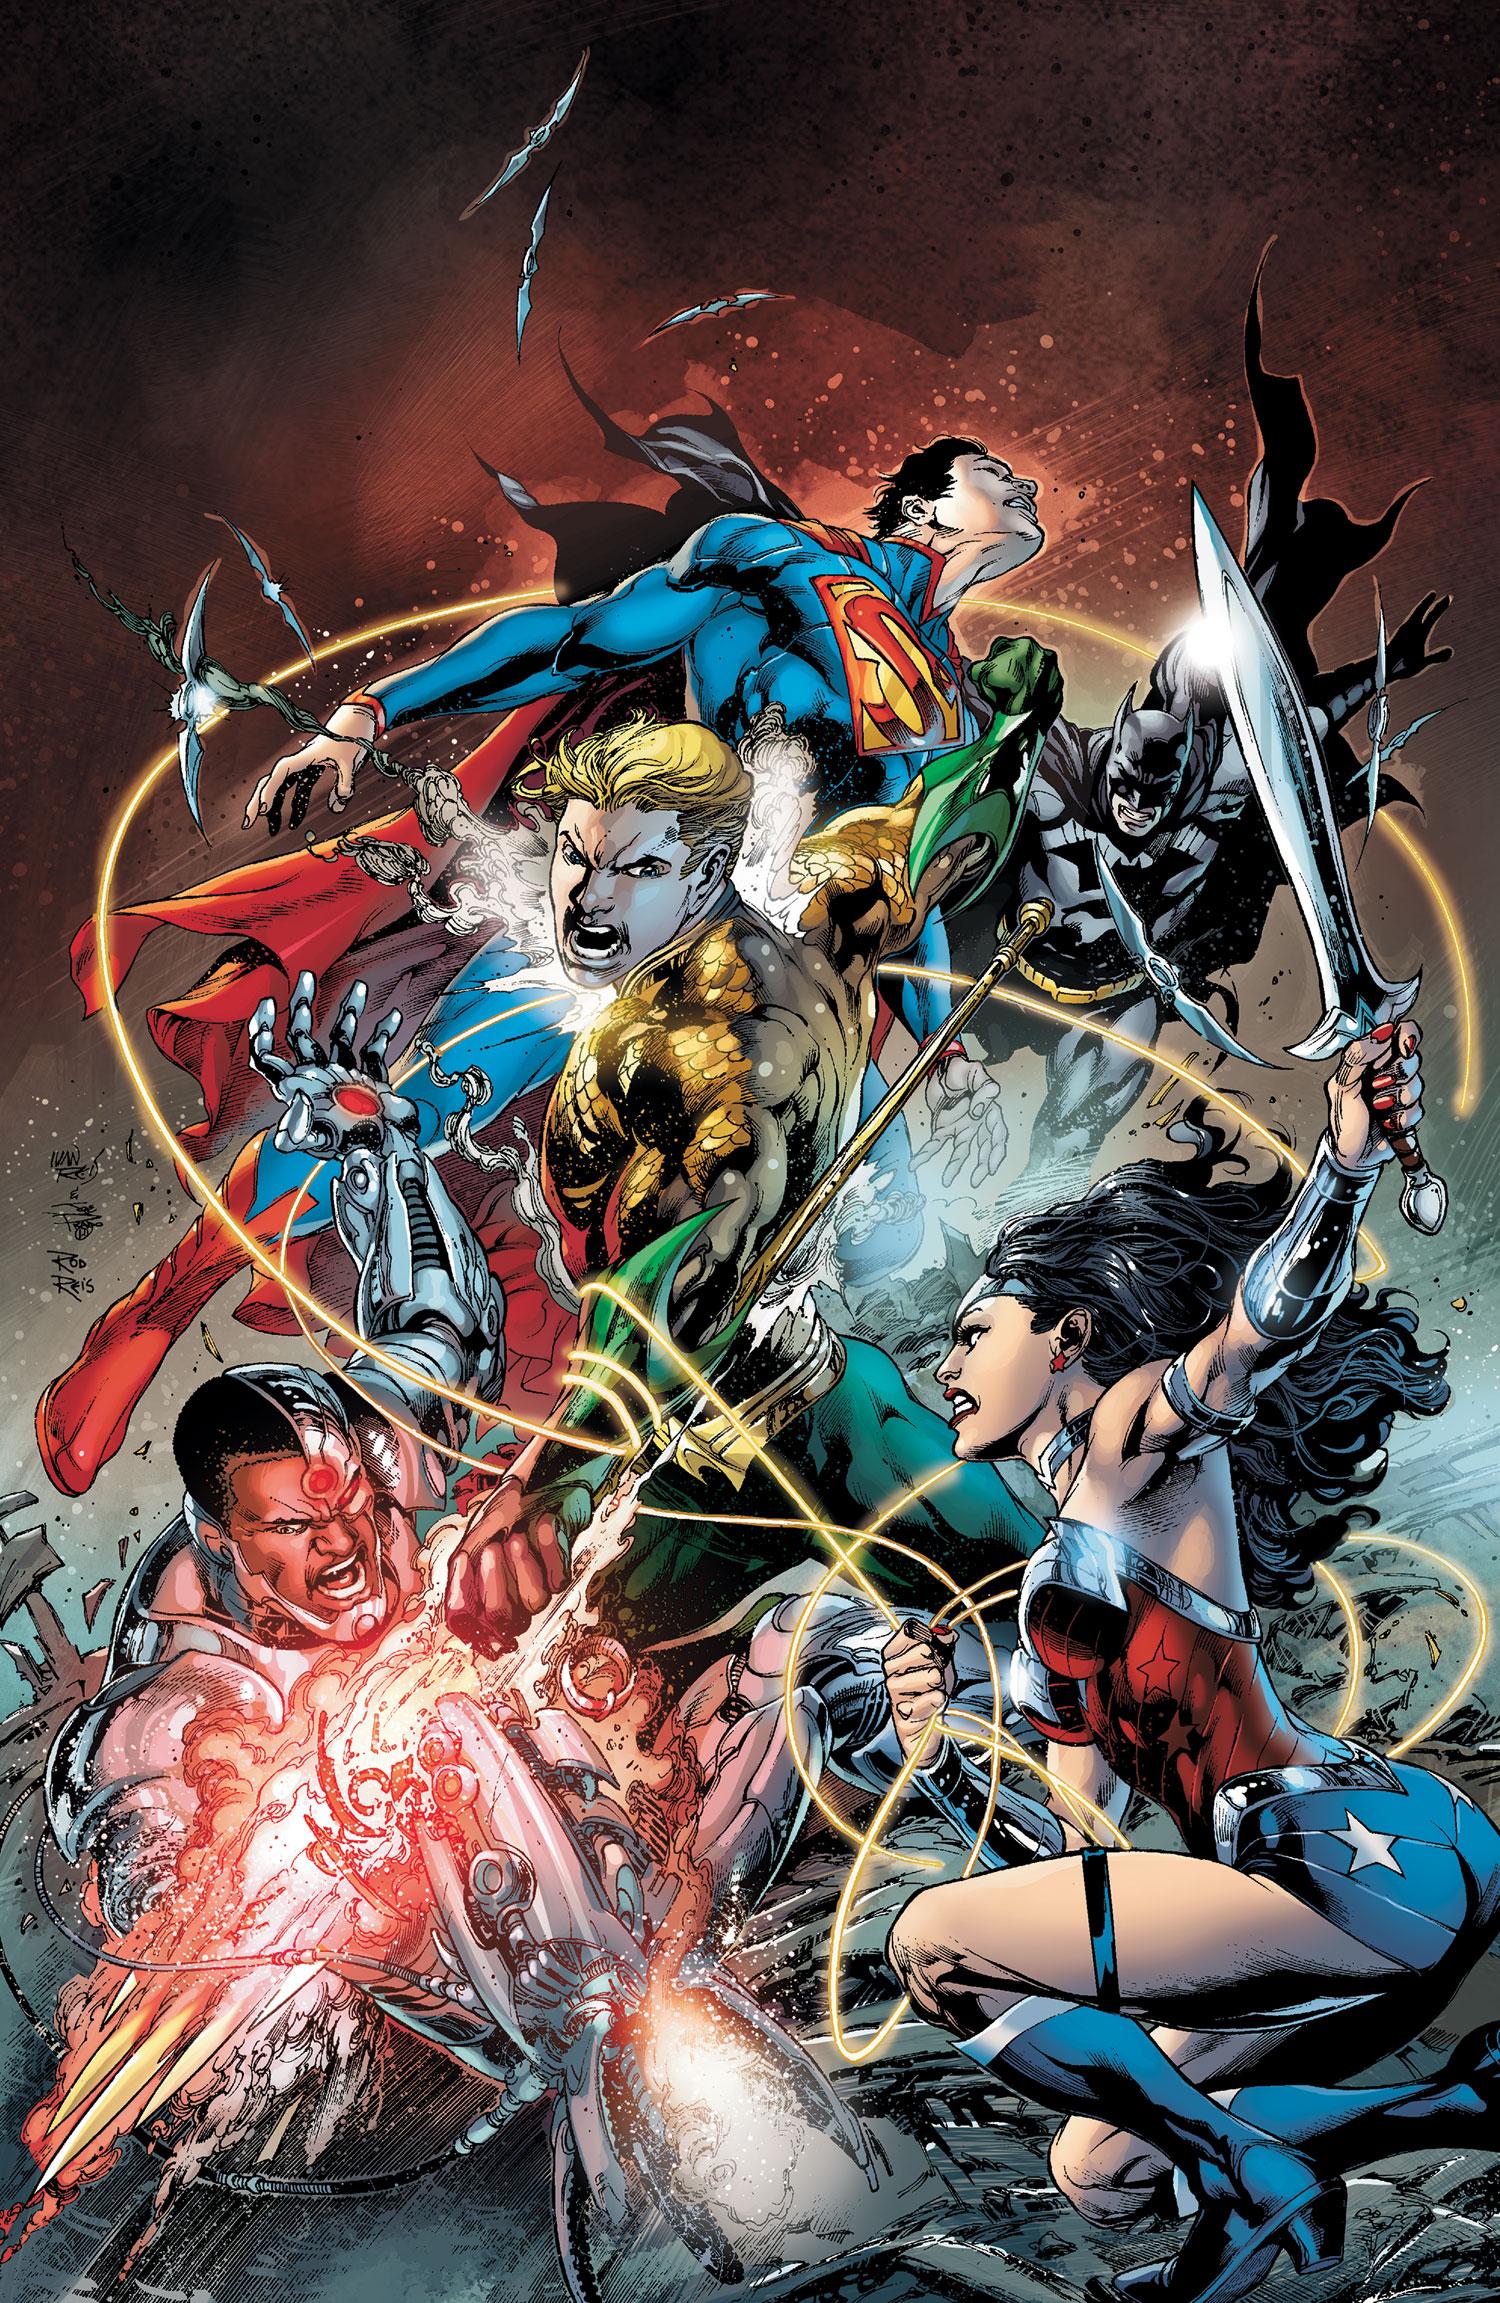 52 Photos 37 Reviews: Justice League New 52 Wallpaper